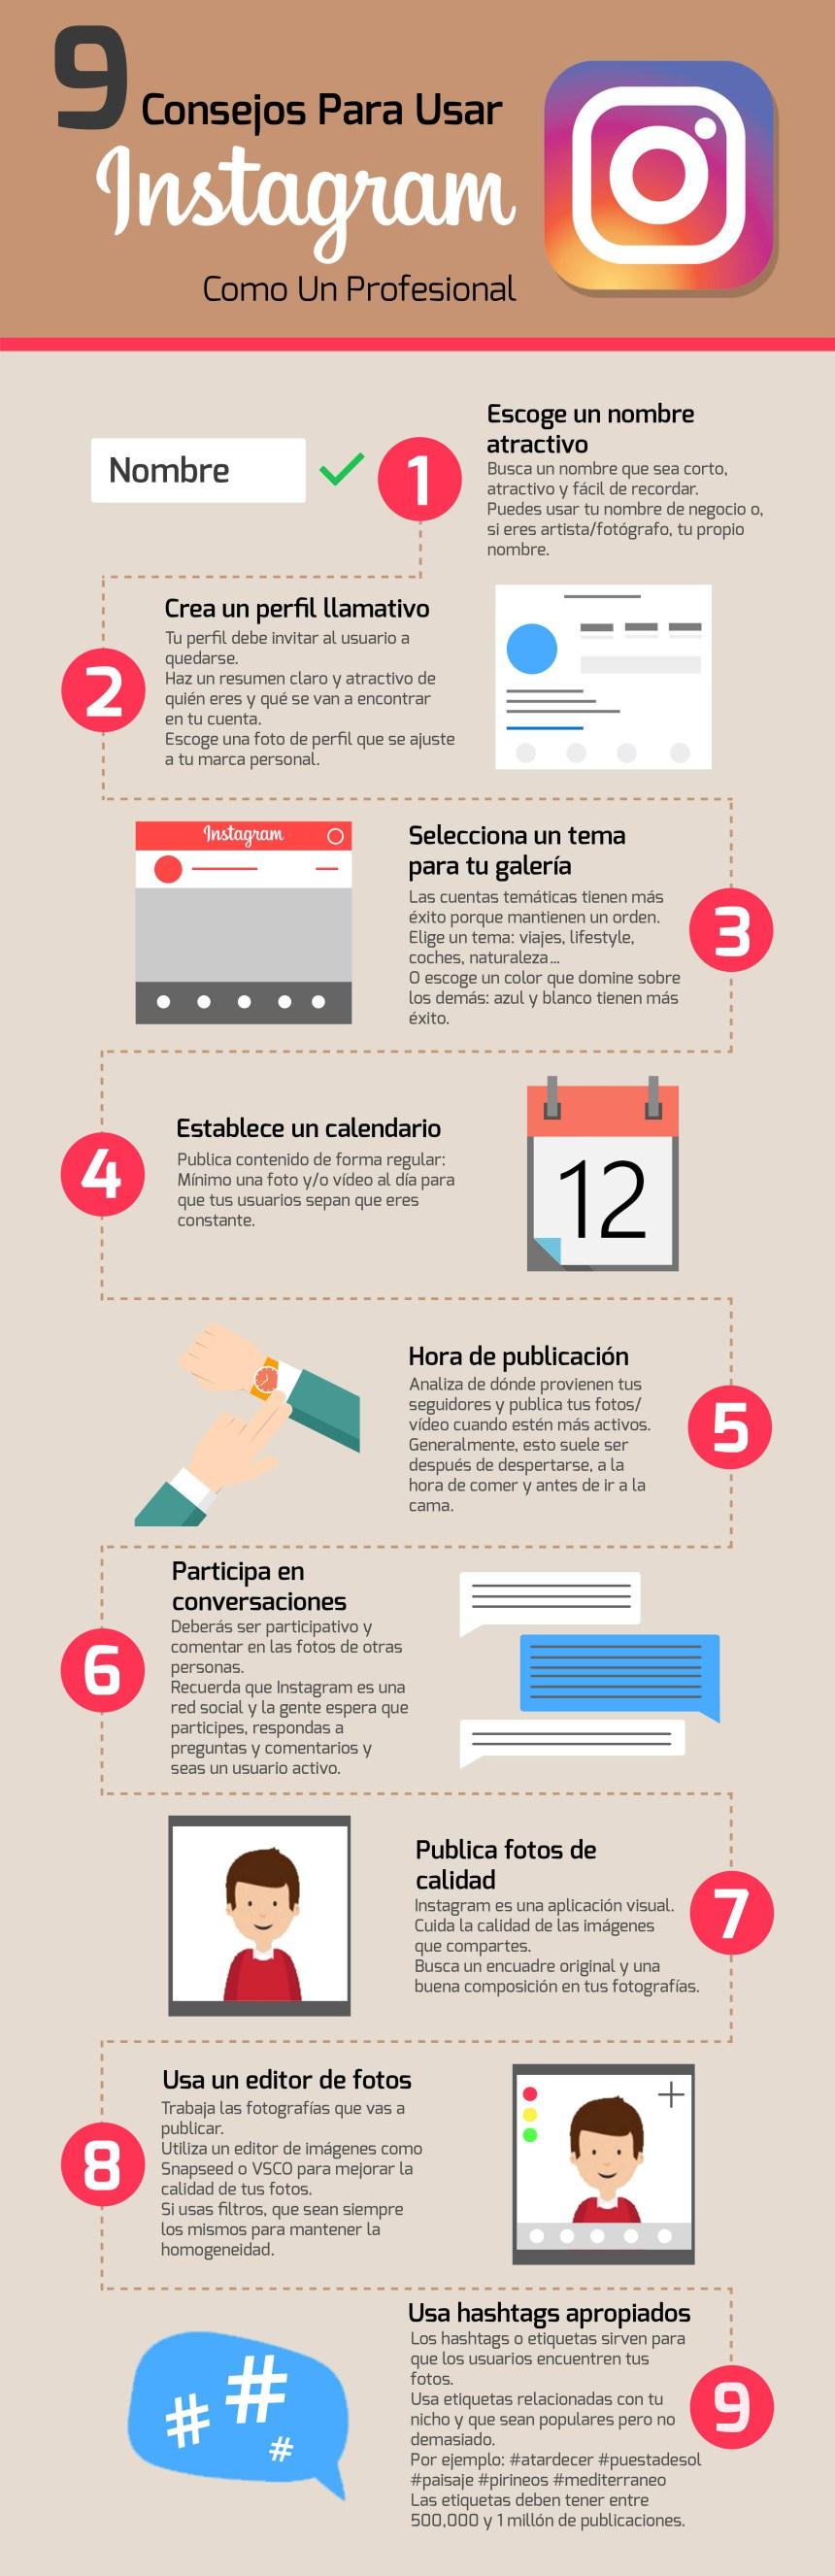 9 consejos para usar Instagram como un profesional #infografia #infographic #socialmedia